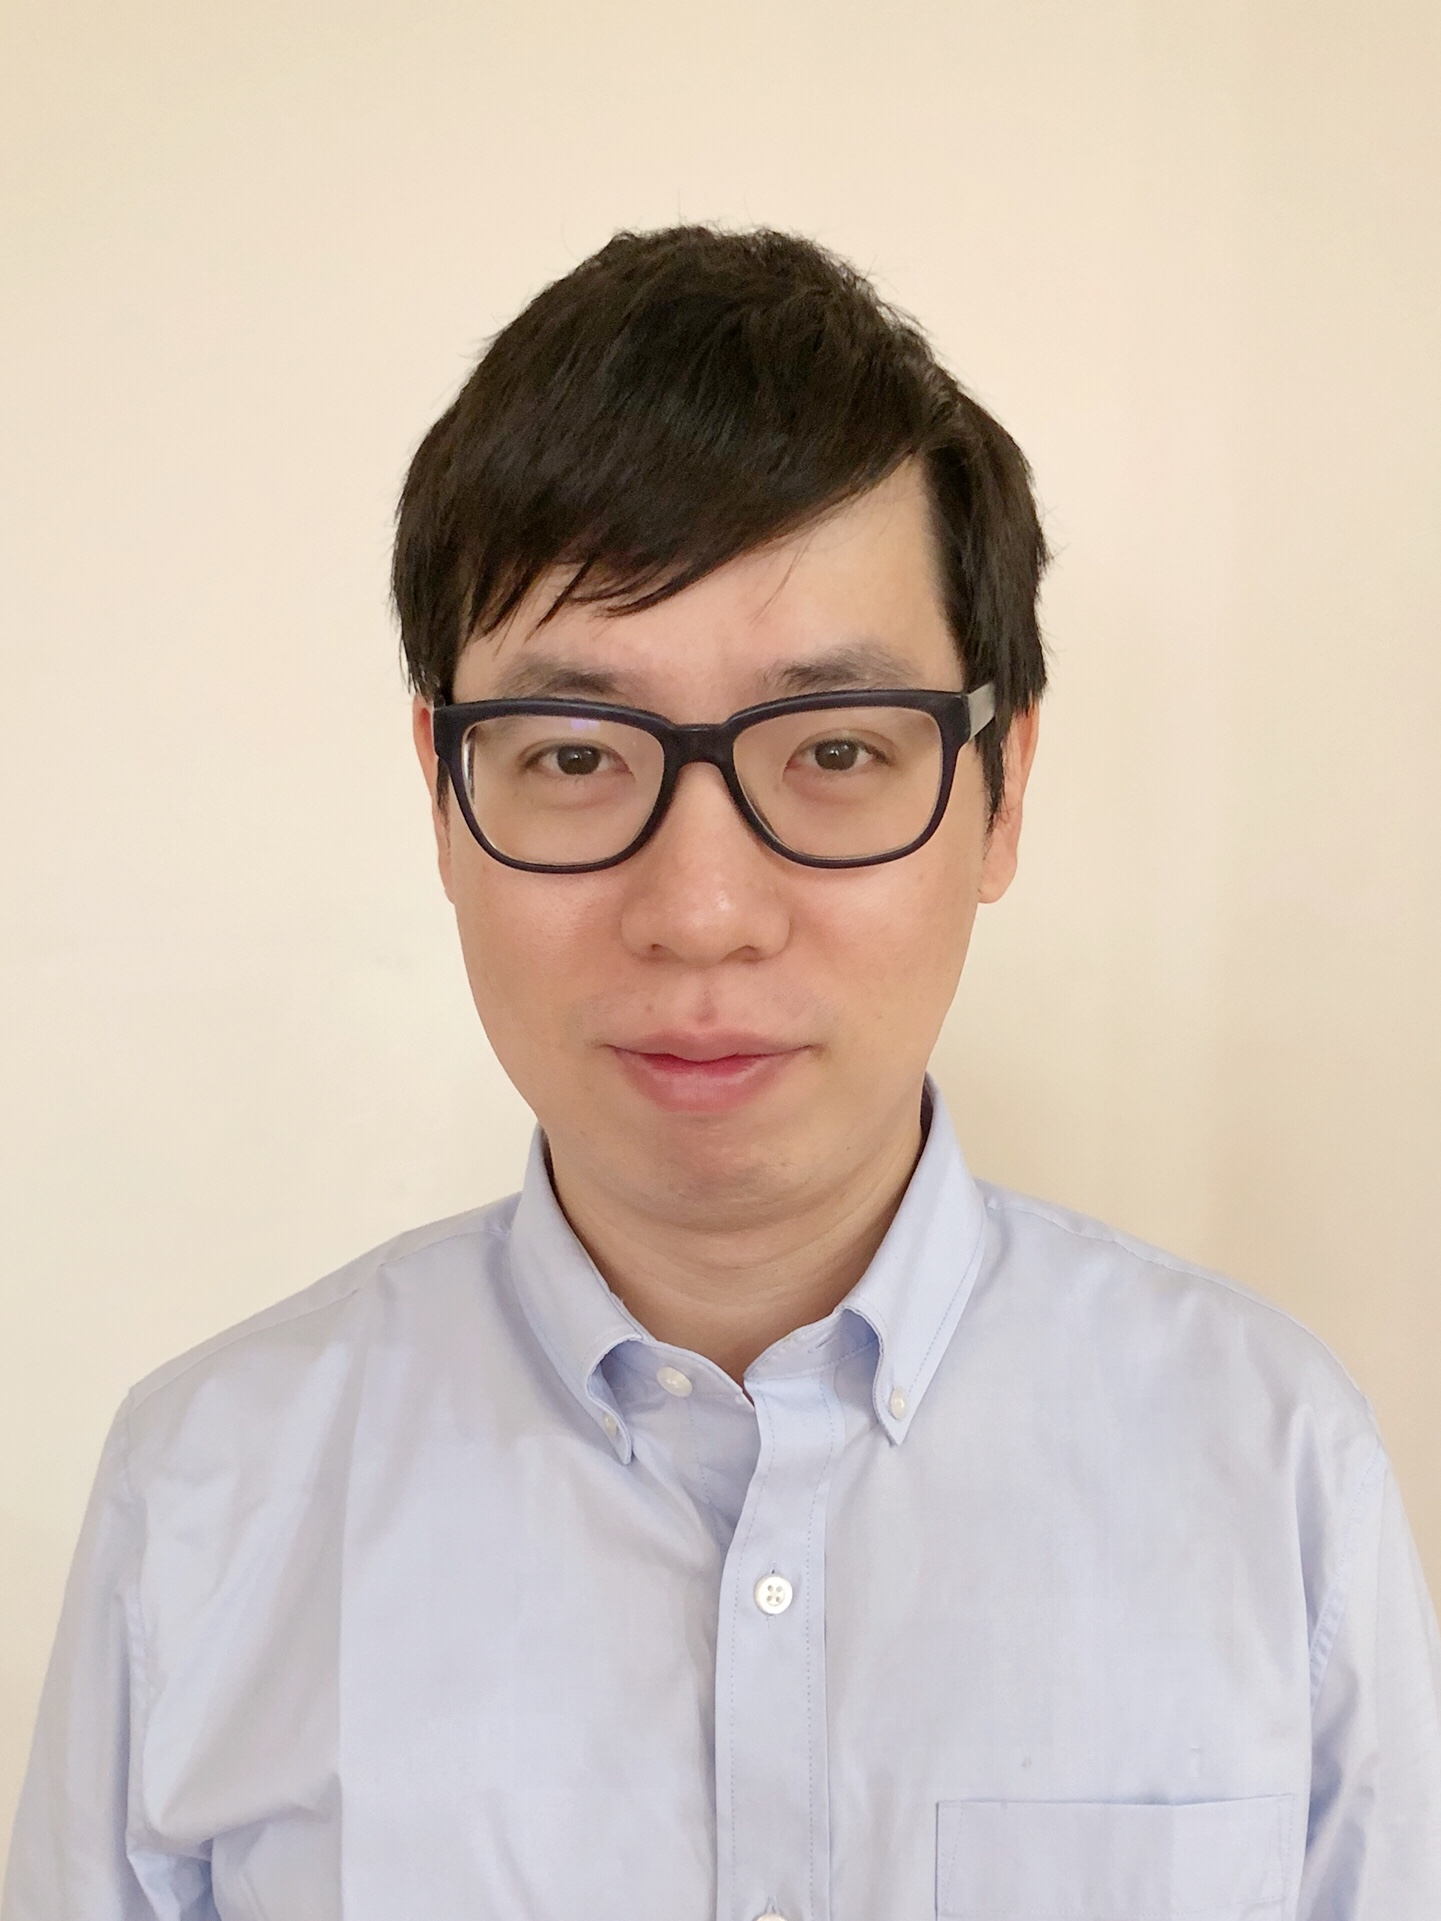 Tianzhou (Charles) Ma